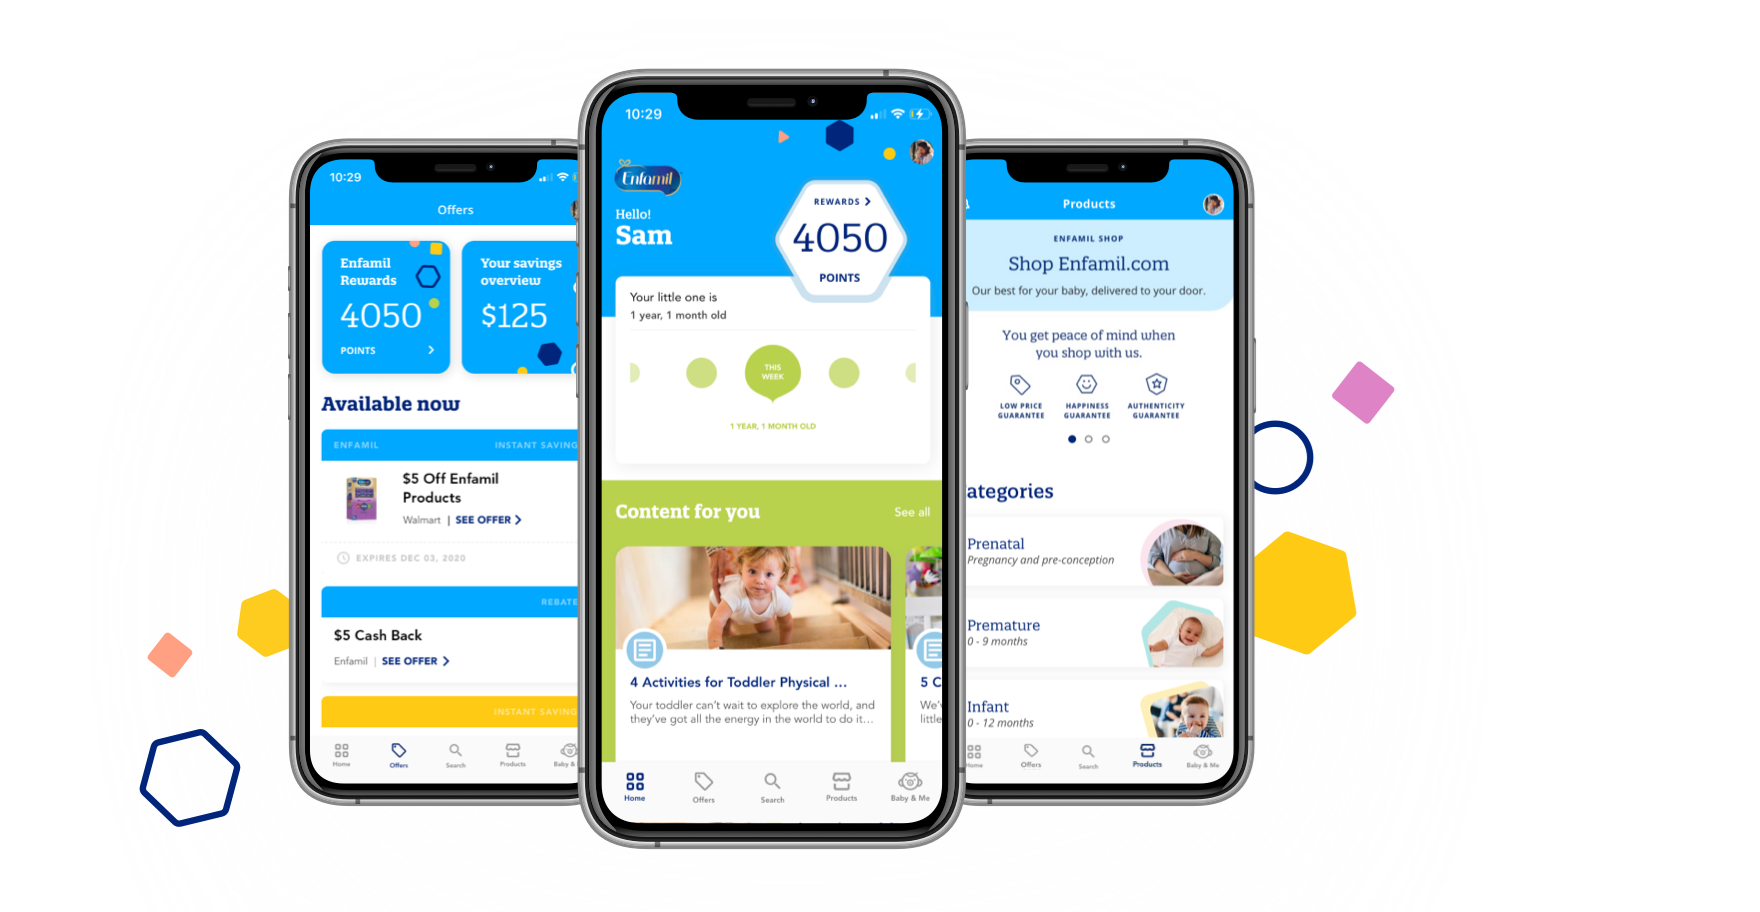 Enfamil Mobile App